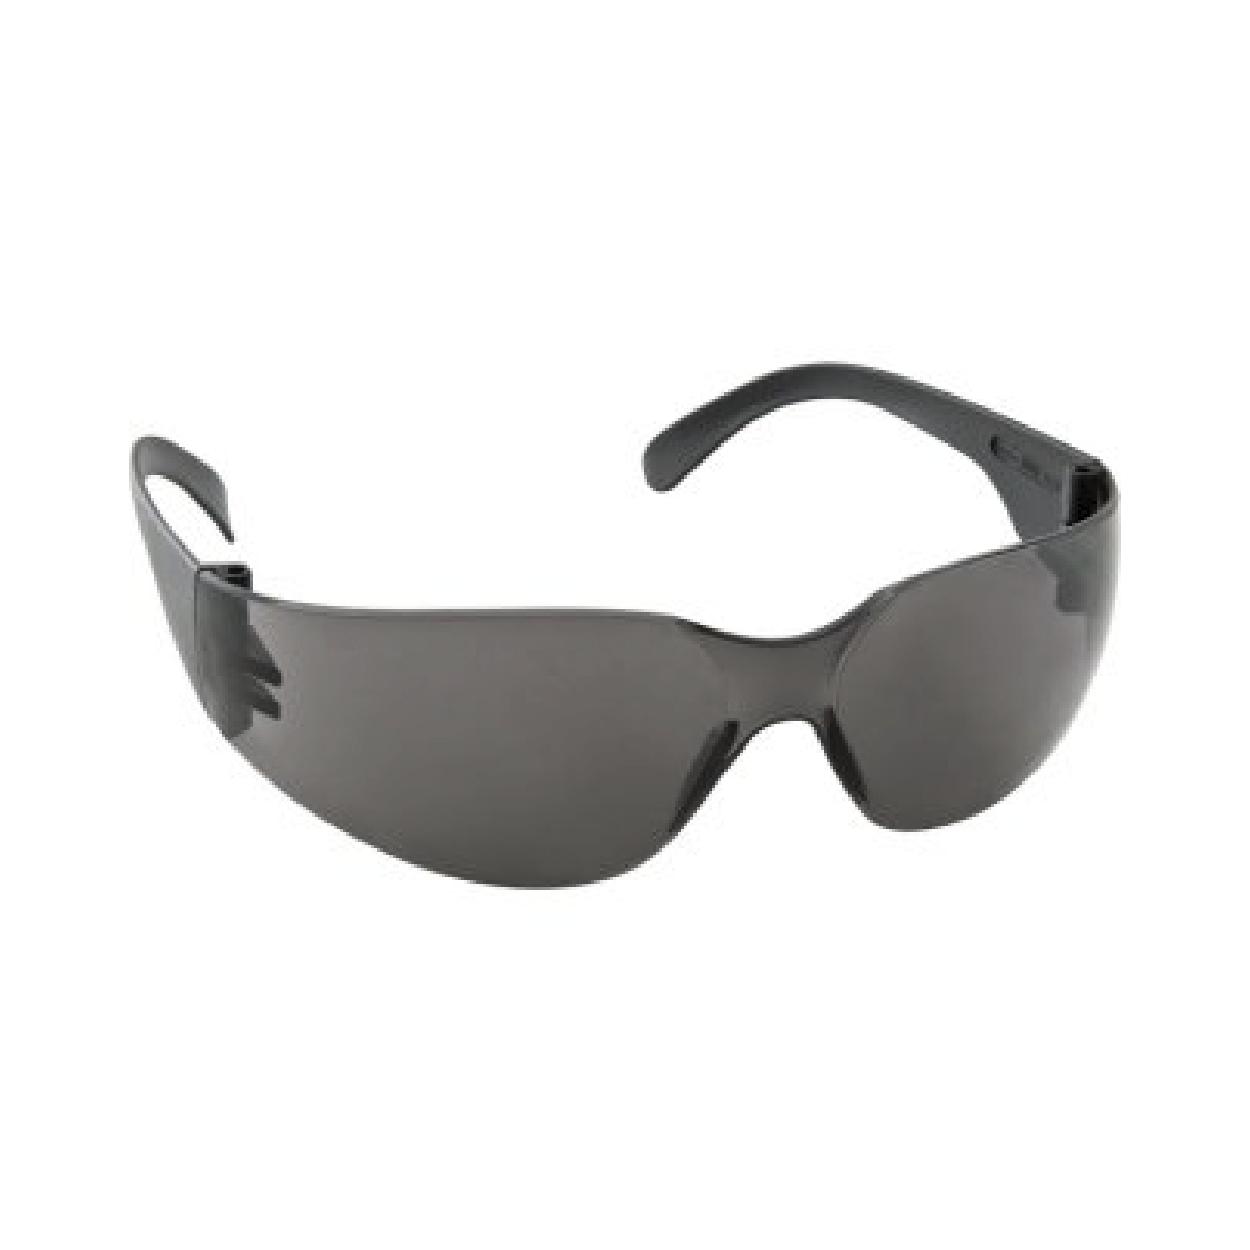 aae73c16d1701 Óculos de Segurança Maltês Fumê Vonder - Fontoura